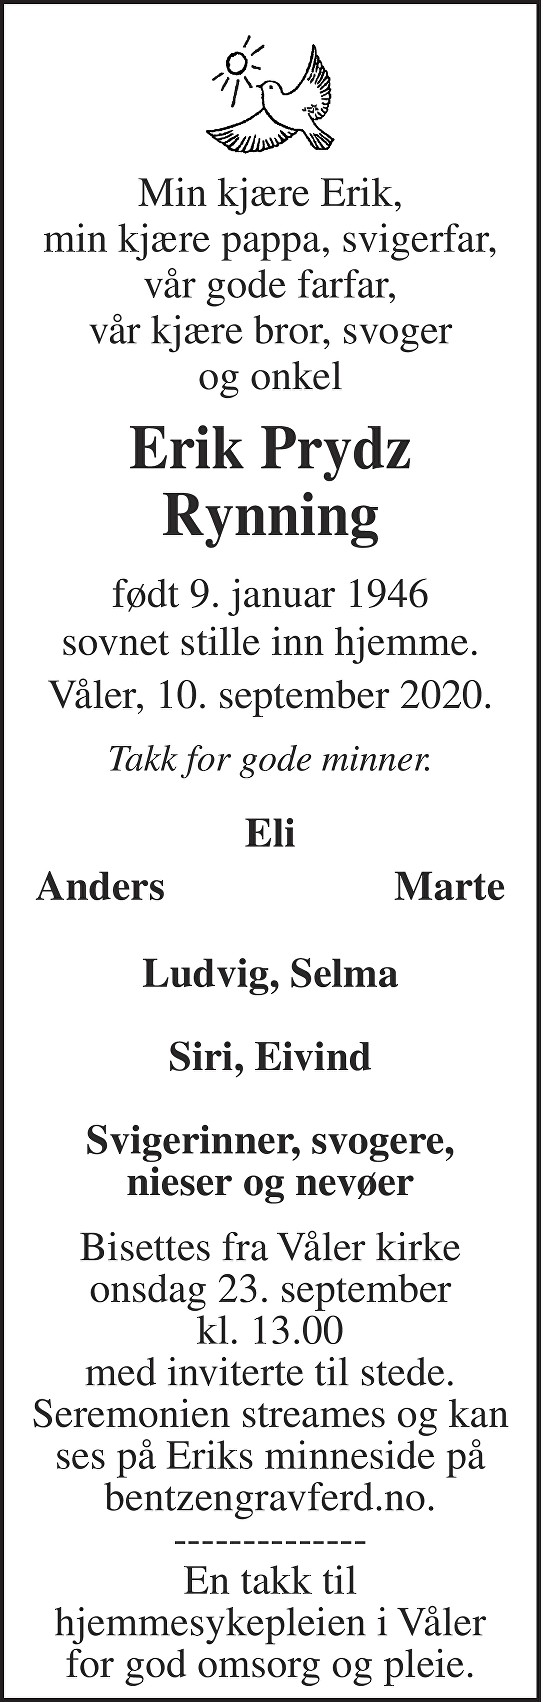 Erik Prydz Rynning Dødsannonse